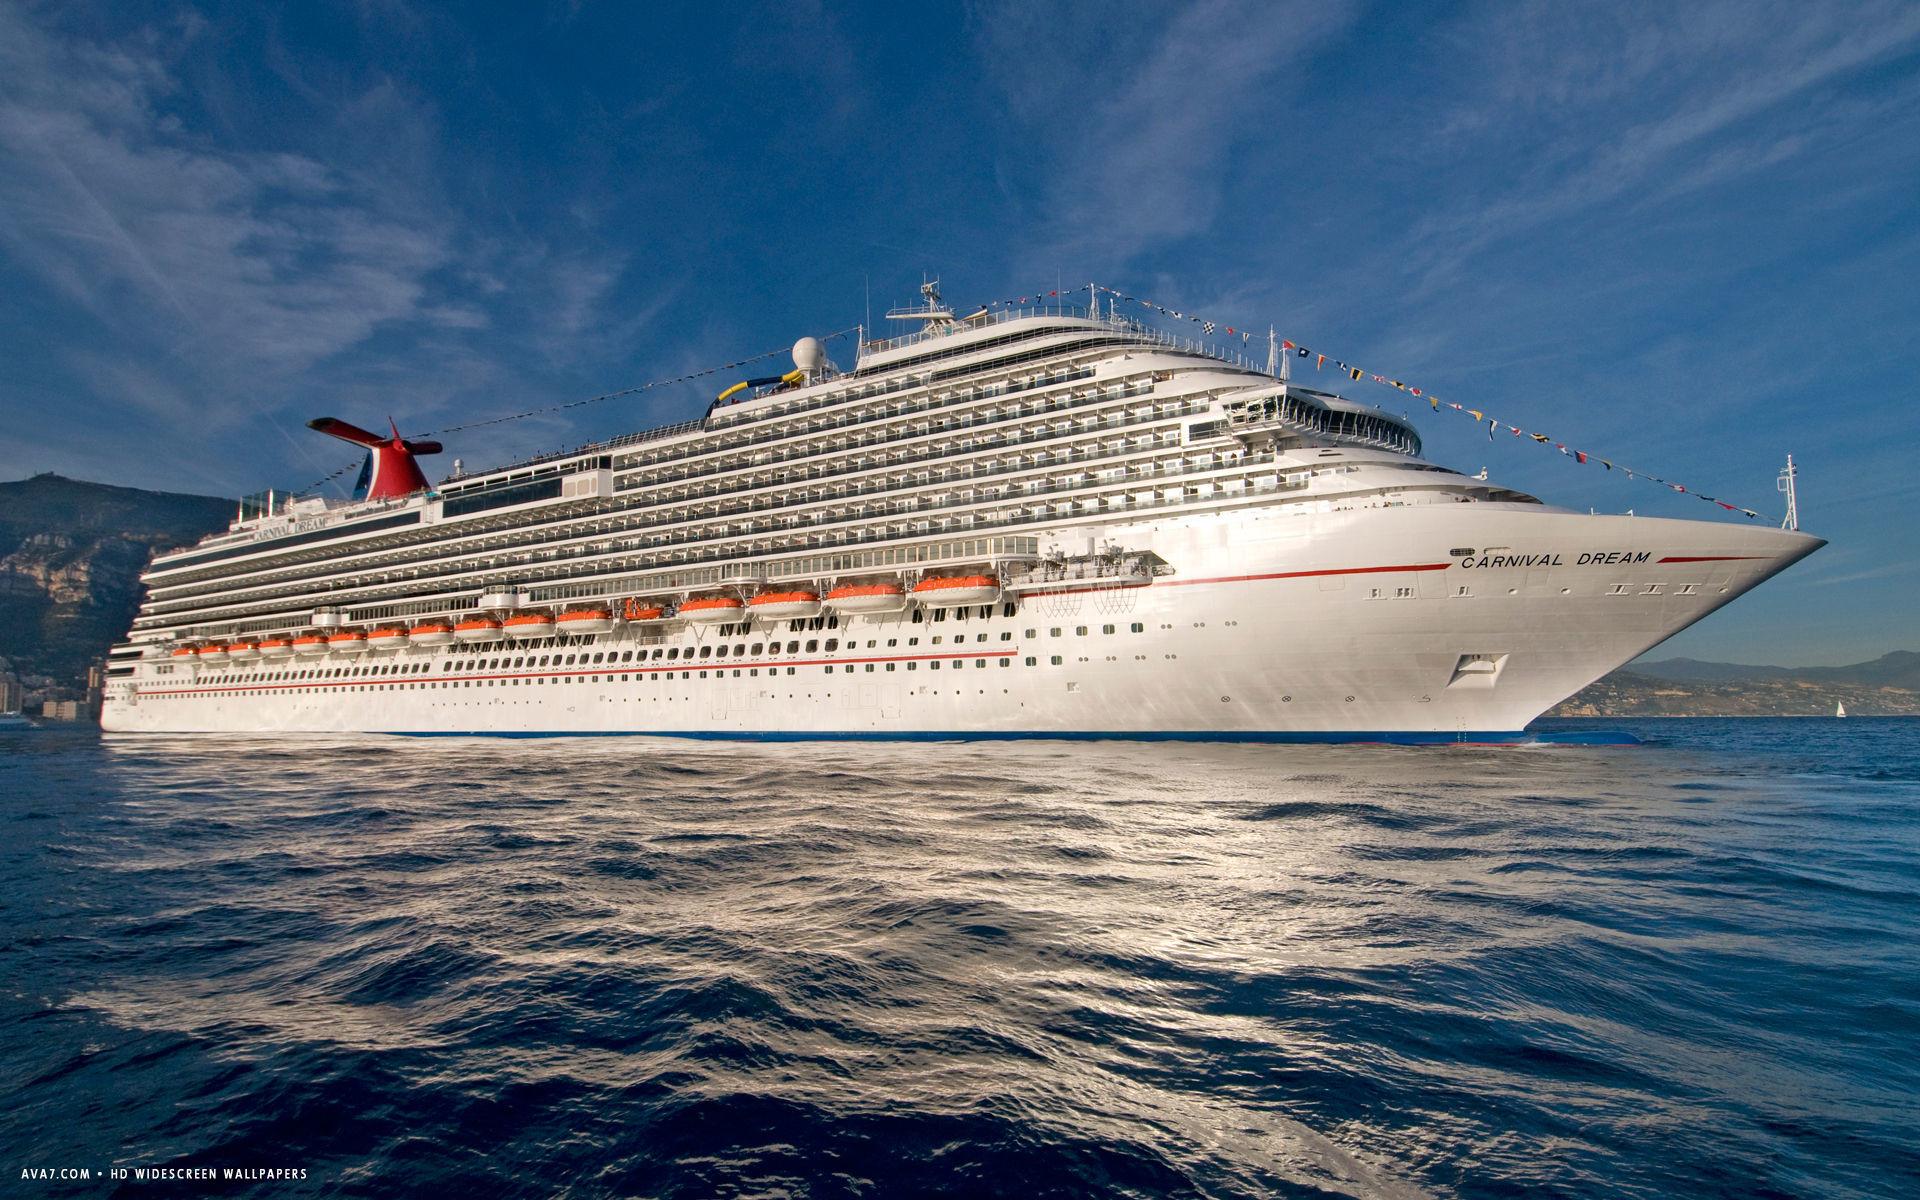 carnival dream cruise ship hd widescreen wallpaper